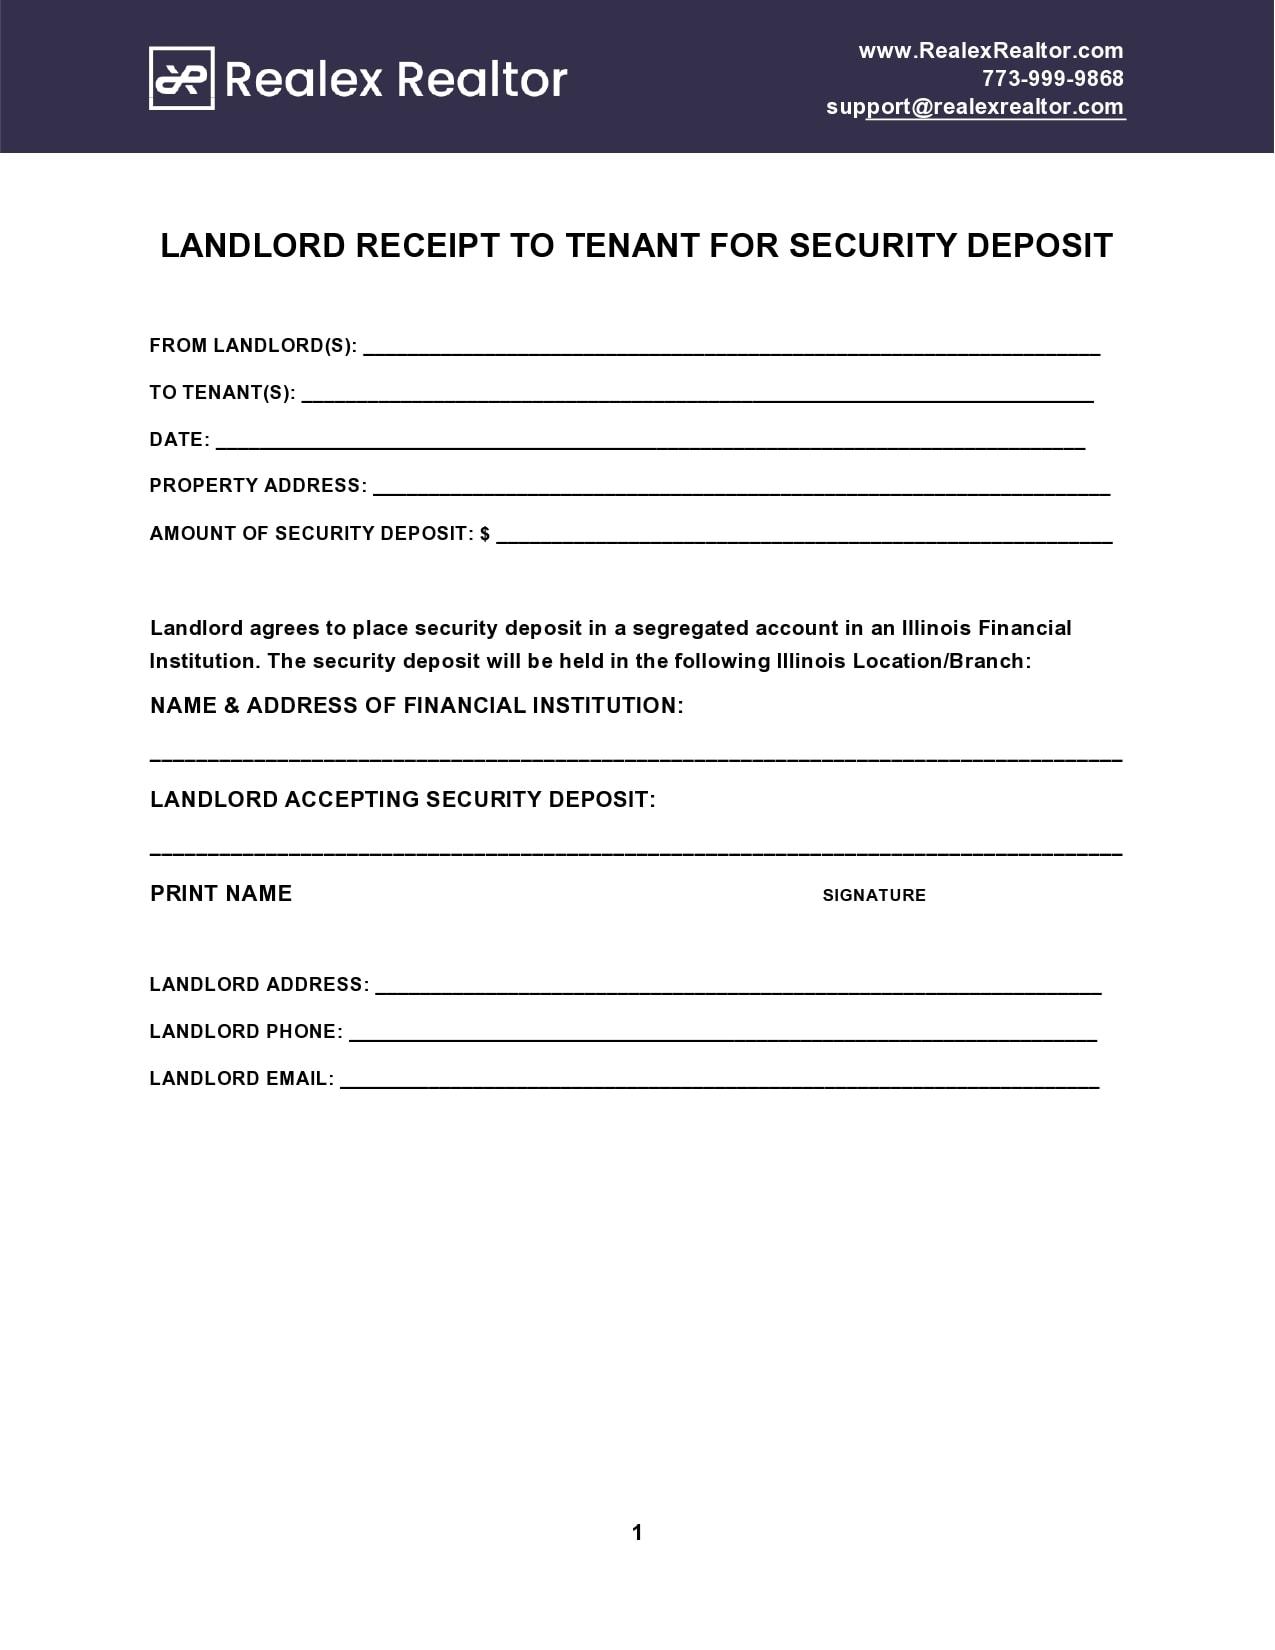 security deposit receipt 07